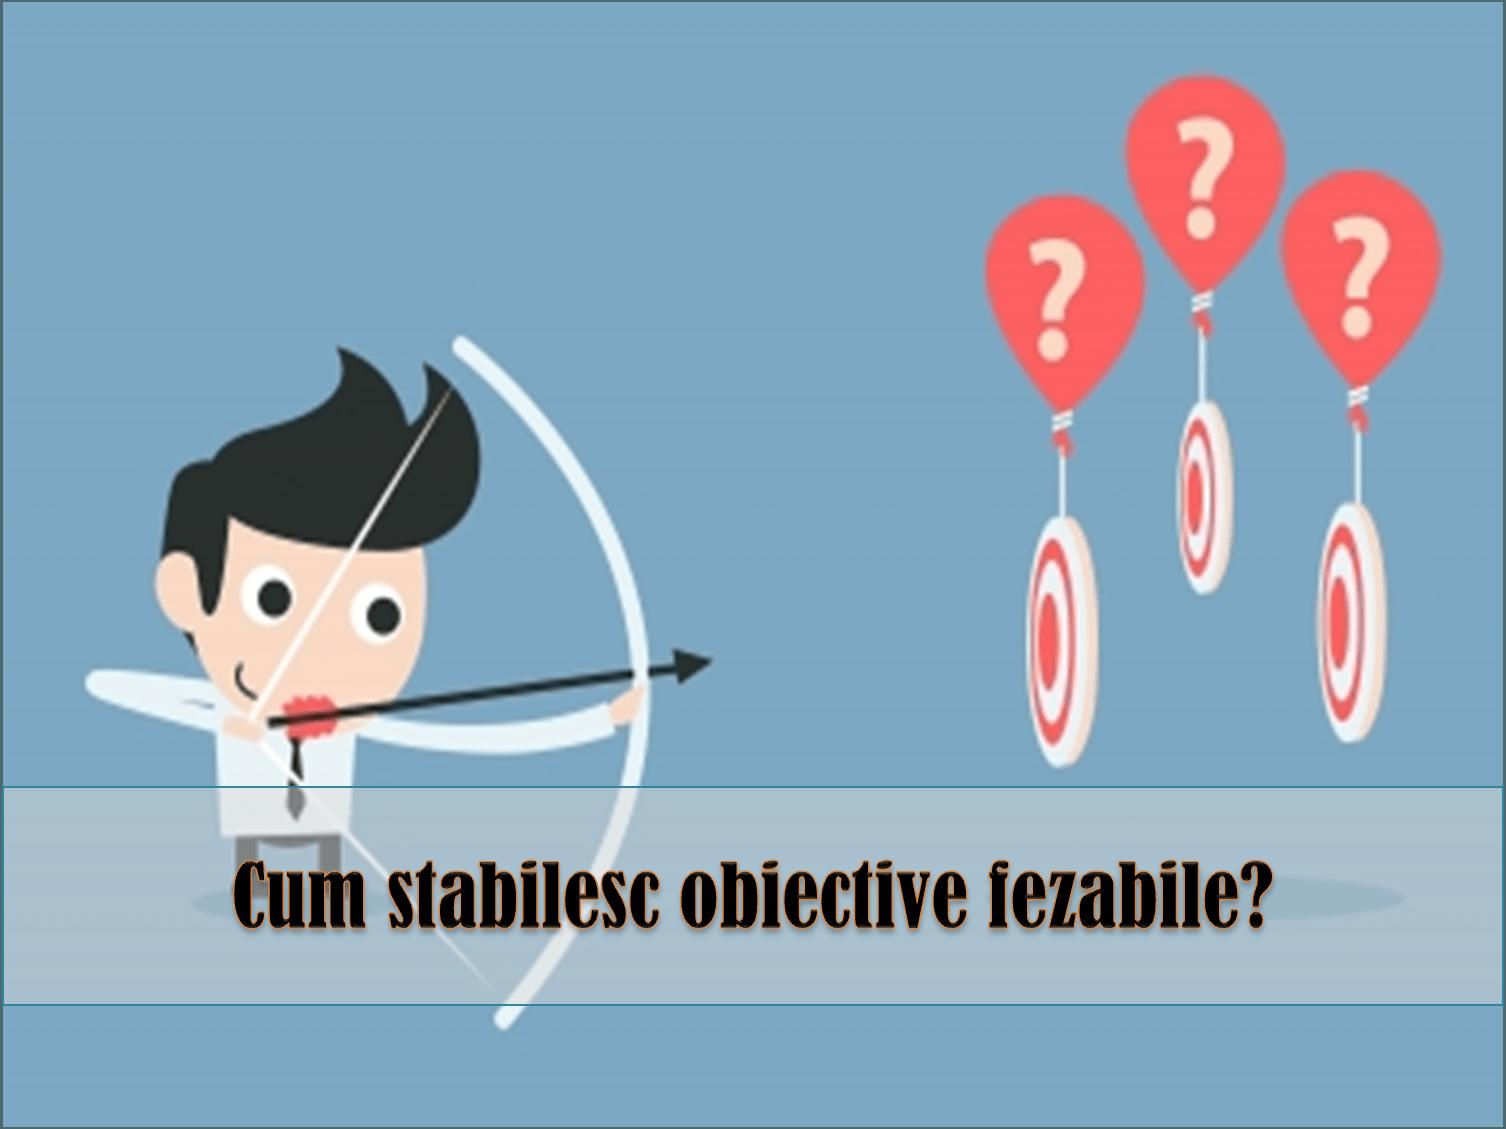 stabilirea obiectivelor personale ghid de stabilire a obiectivelor ghid de stabilire a obiectivelor